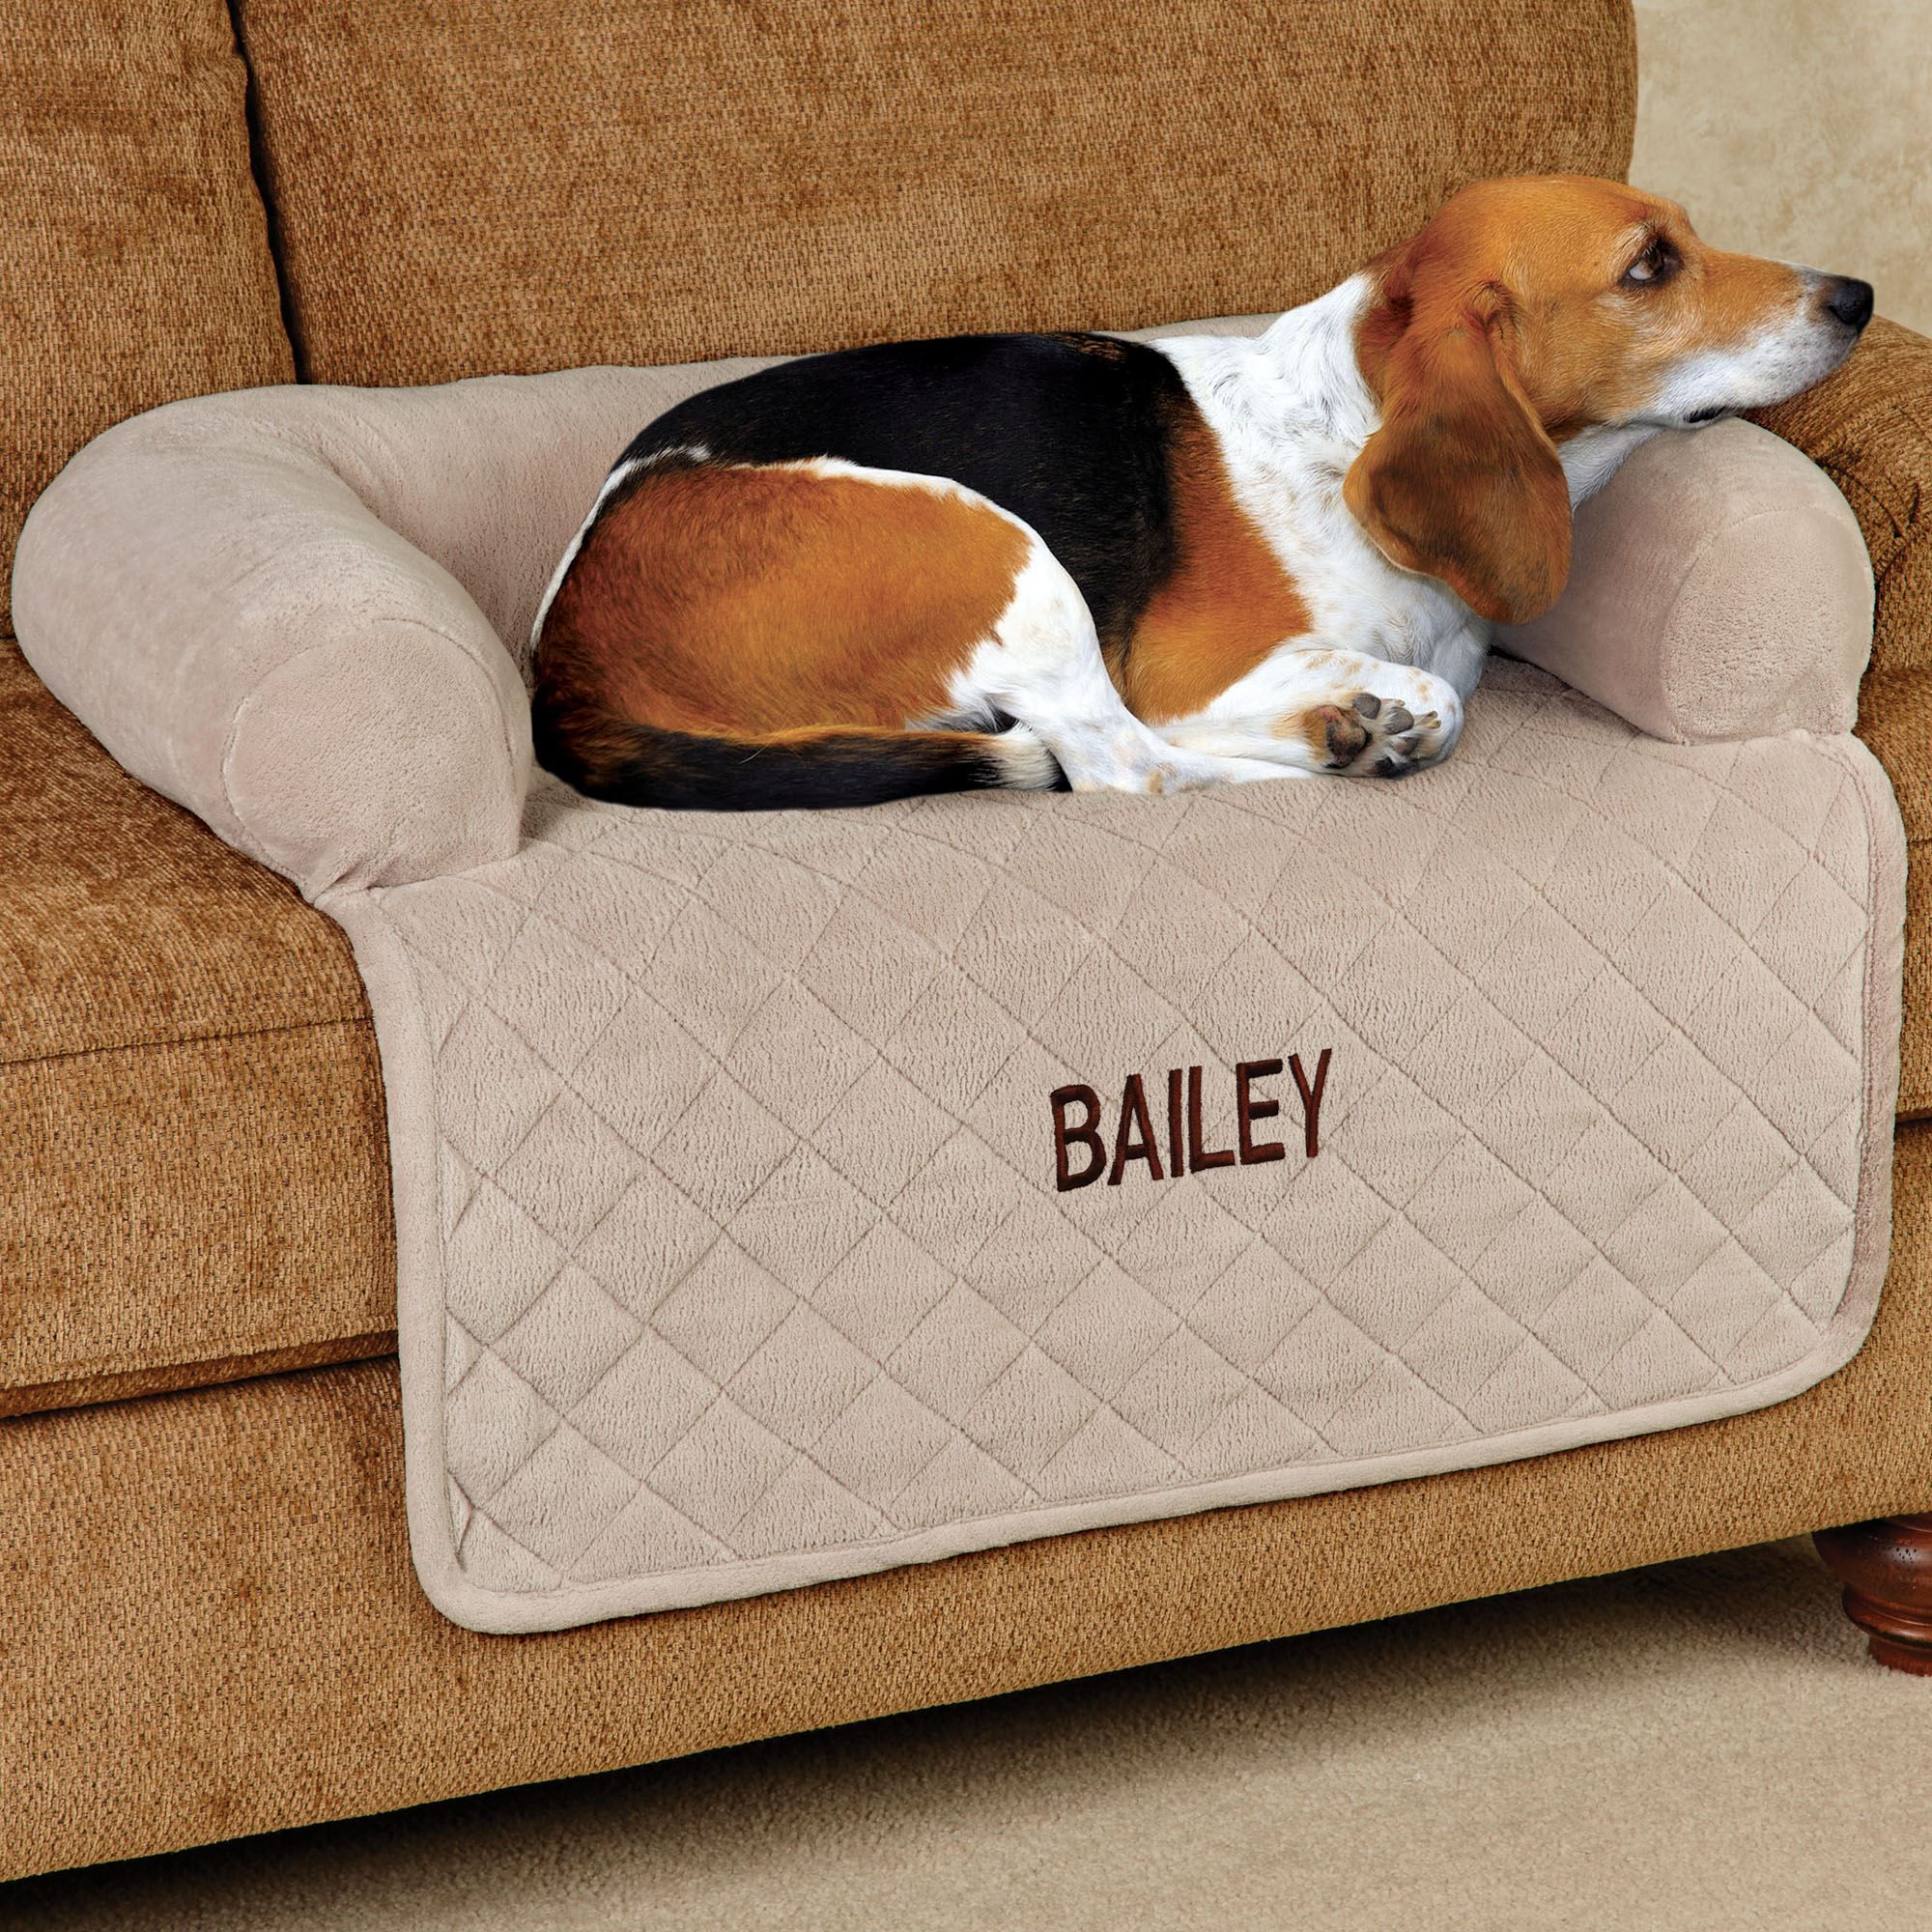 Superb Ultimate Microplush Quilted Pet Cover With Bolster Home Inzonedesignstudio Interior Chair Design Inzonedesignstudiocom